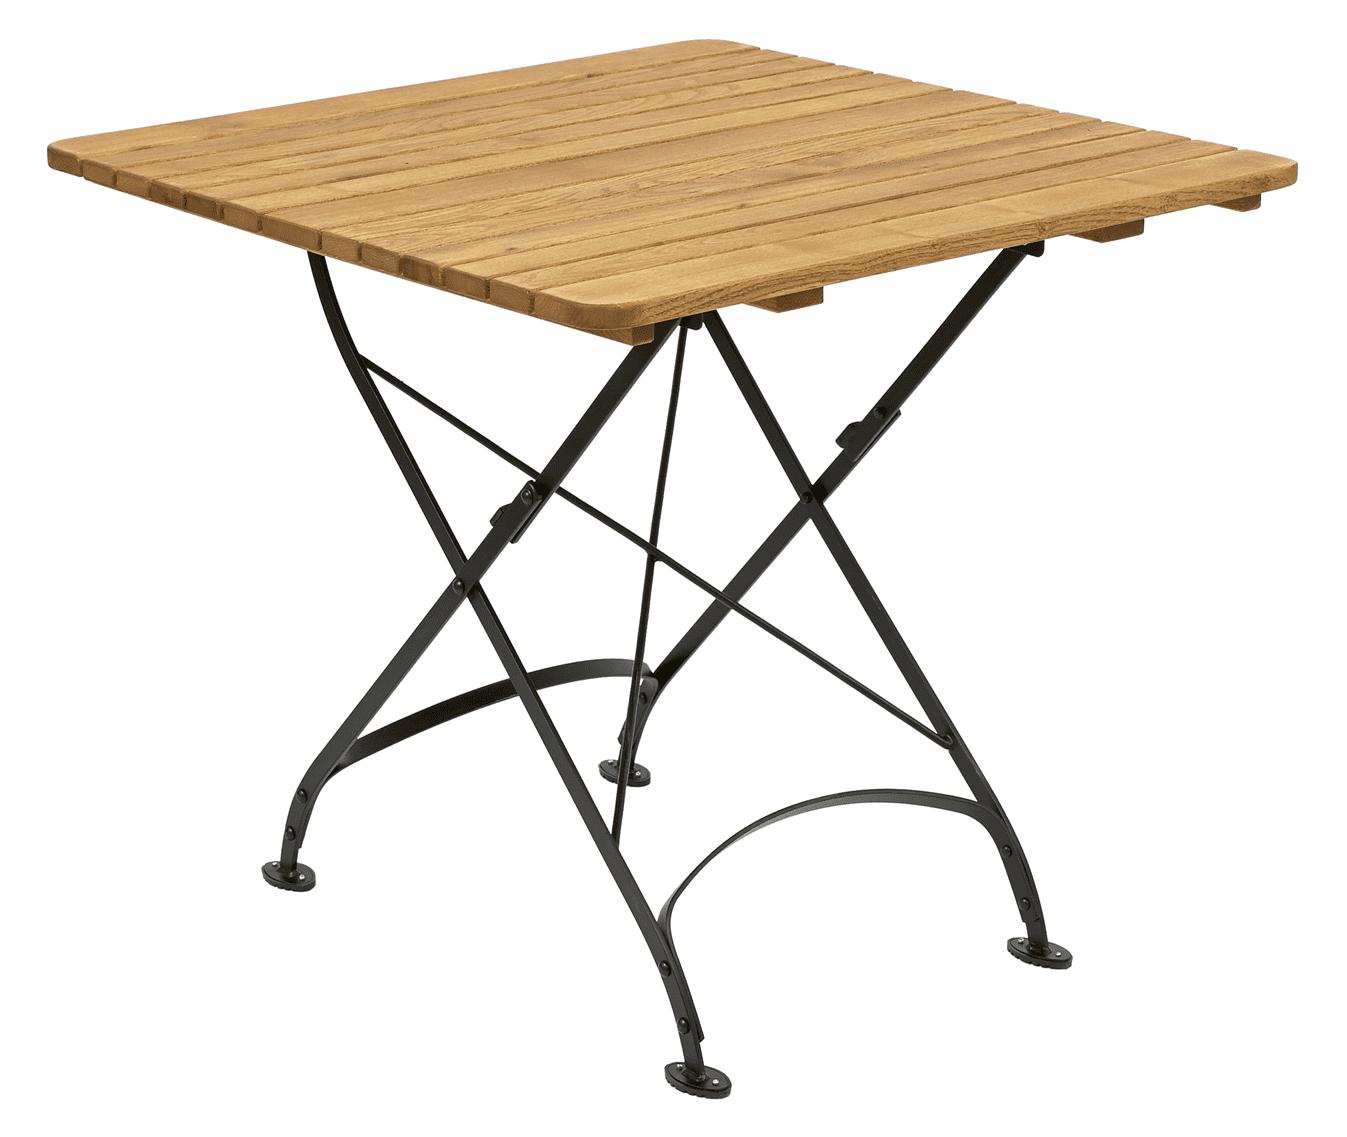 PARADE SQ FOLDING TABLE FSC ROB 700mm